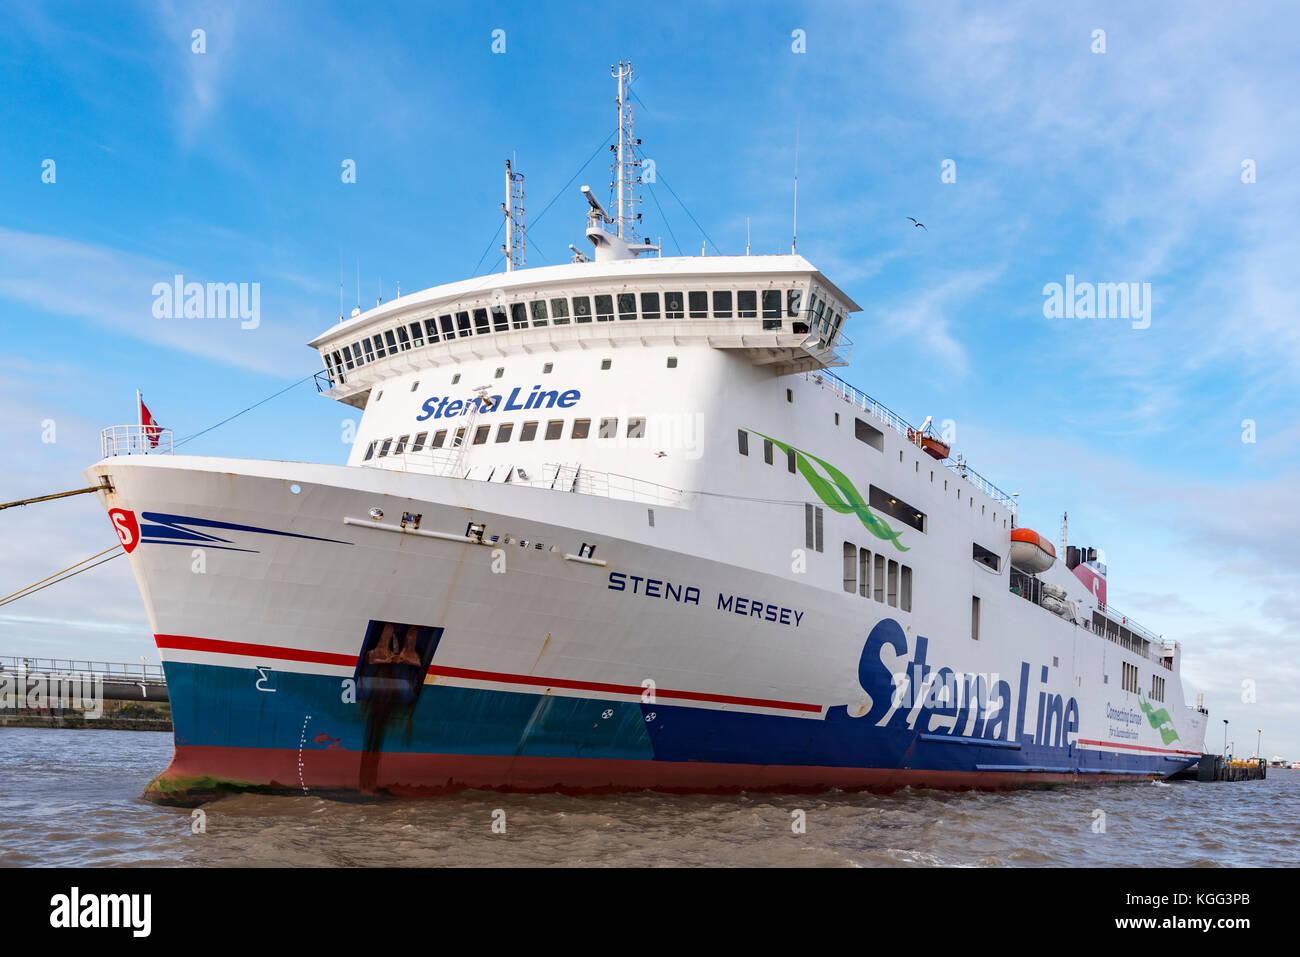 The ro-ro car ferry the Stena Mersey at the Twelve Quays terminal in Birkenhead. The ro-ro car ferry Stena Merseyat - Stock Image